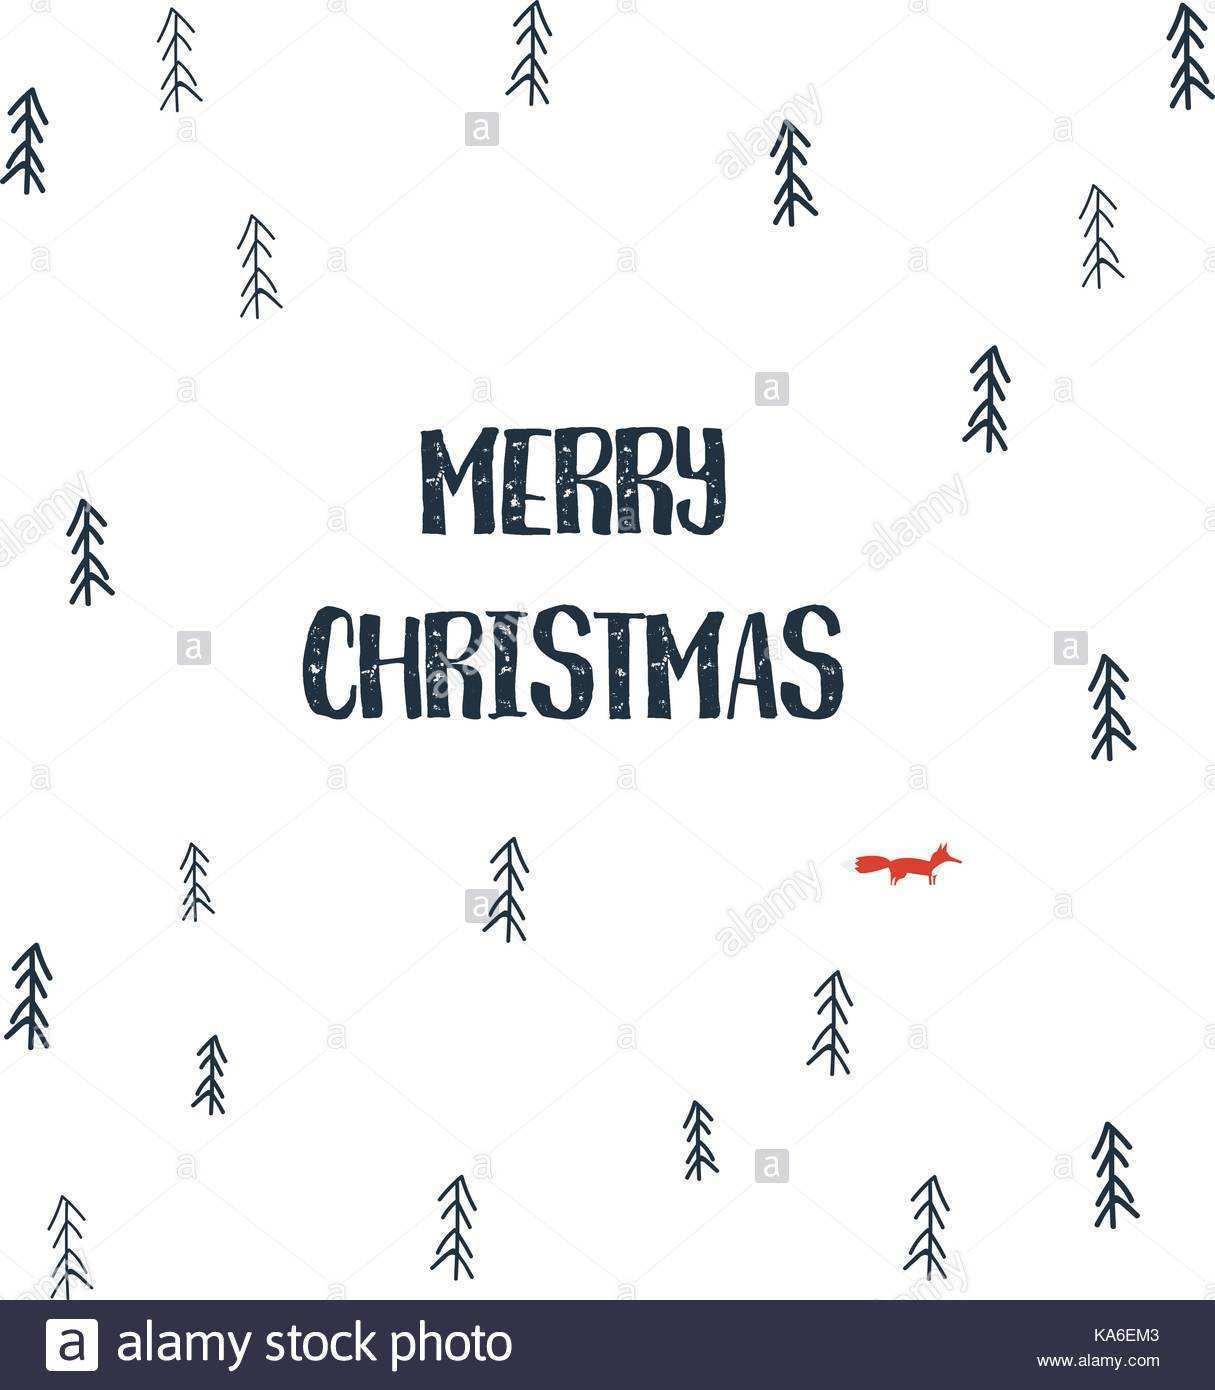 20 Create Christmas Card Template Small Photo with Christmas Card Template Small